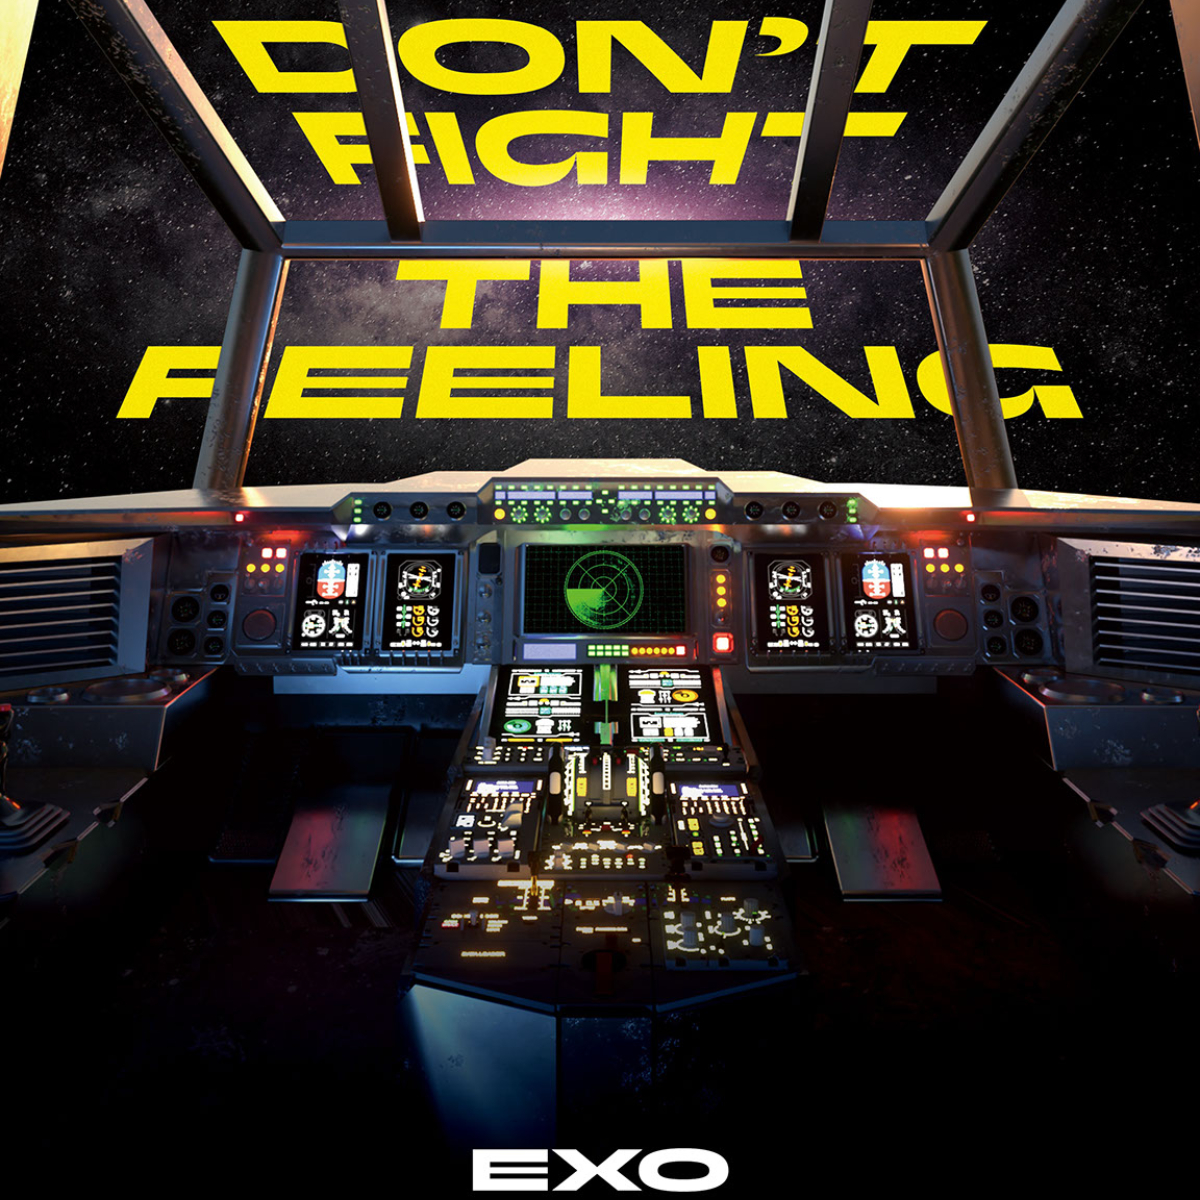 EXO : Don't Fight The Feeling MV + Don't Fight The Feeling Album Download